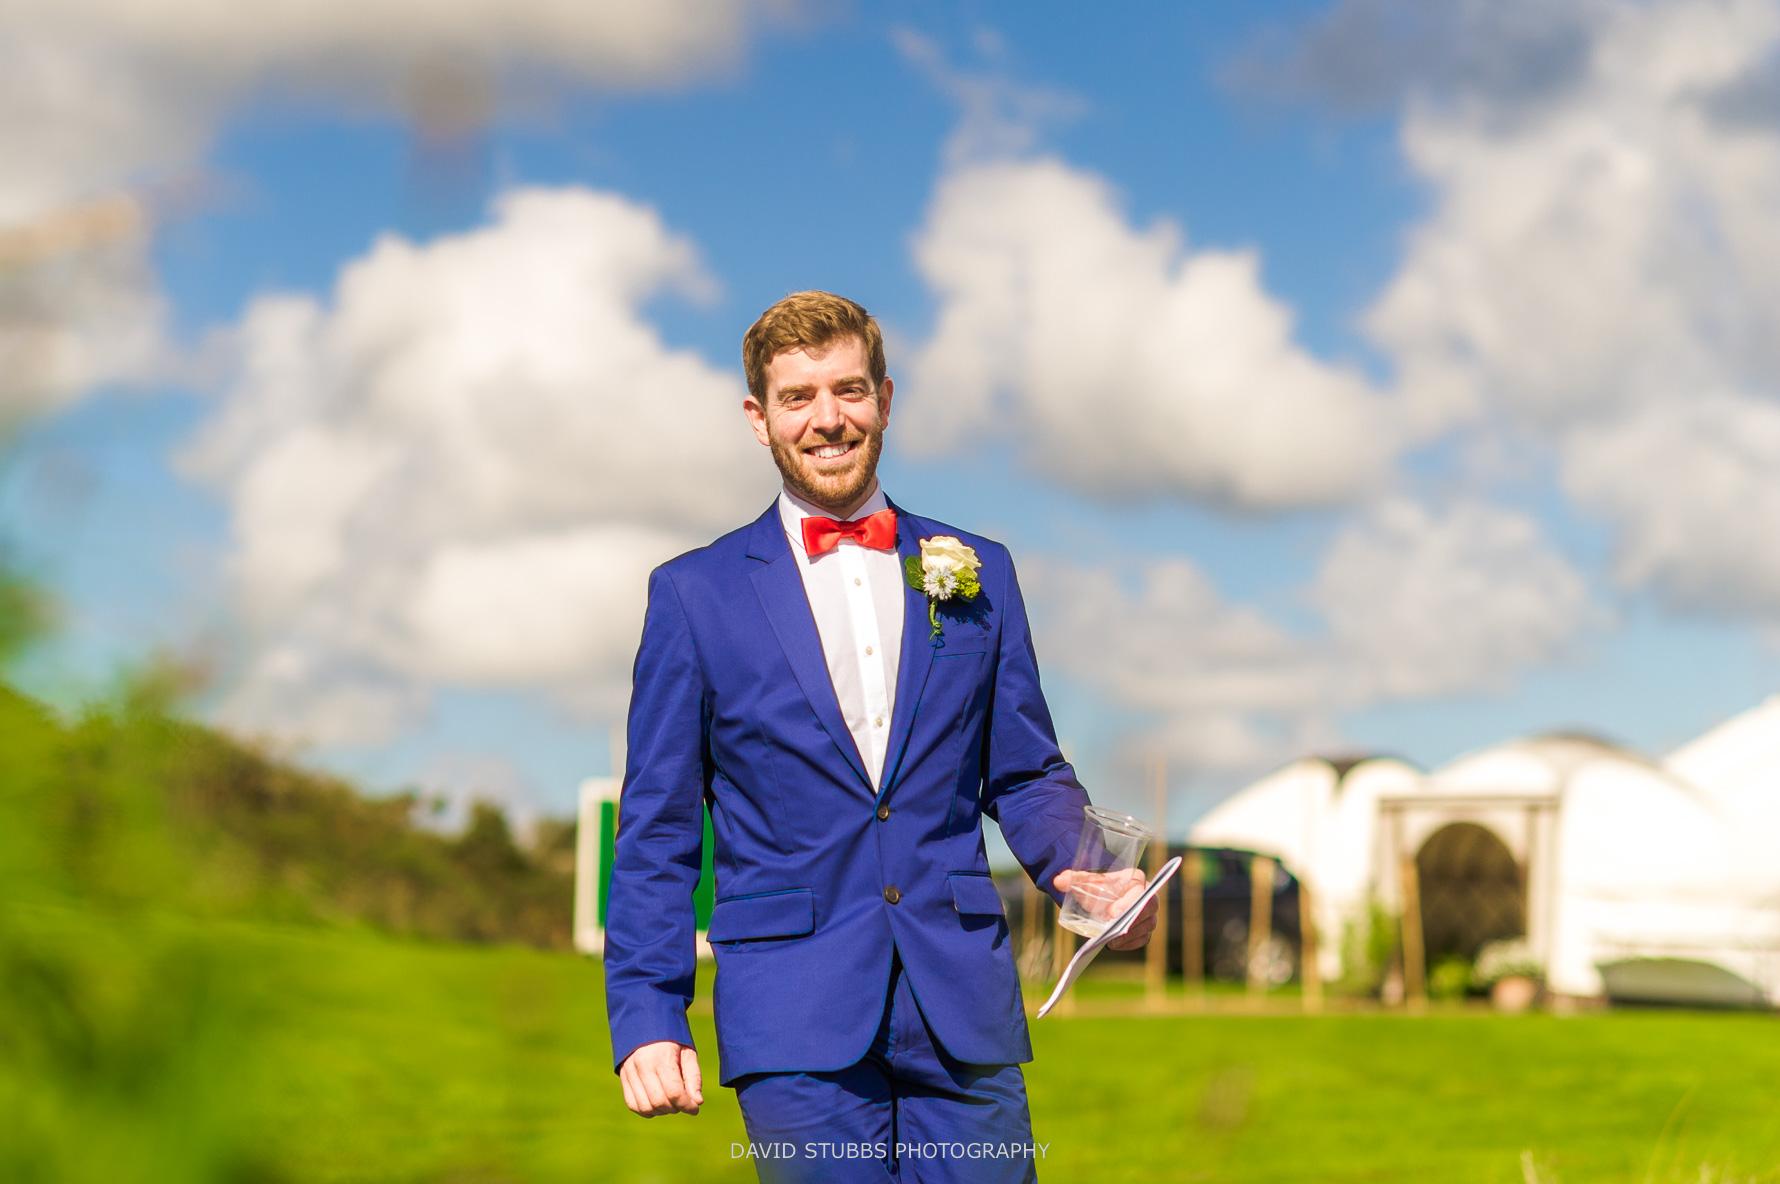 the groom walking along